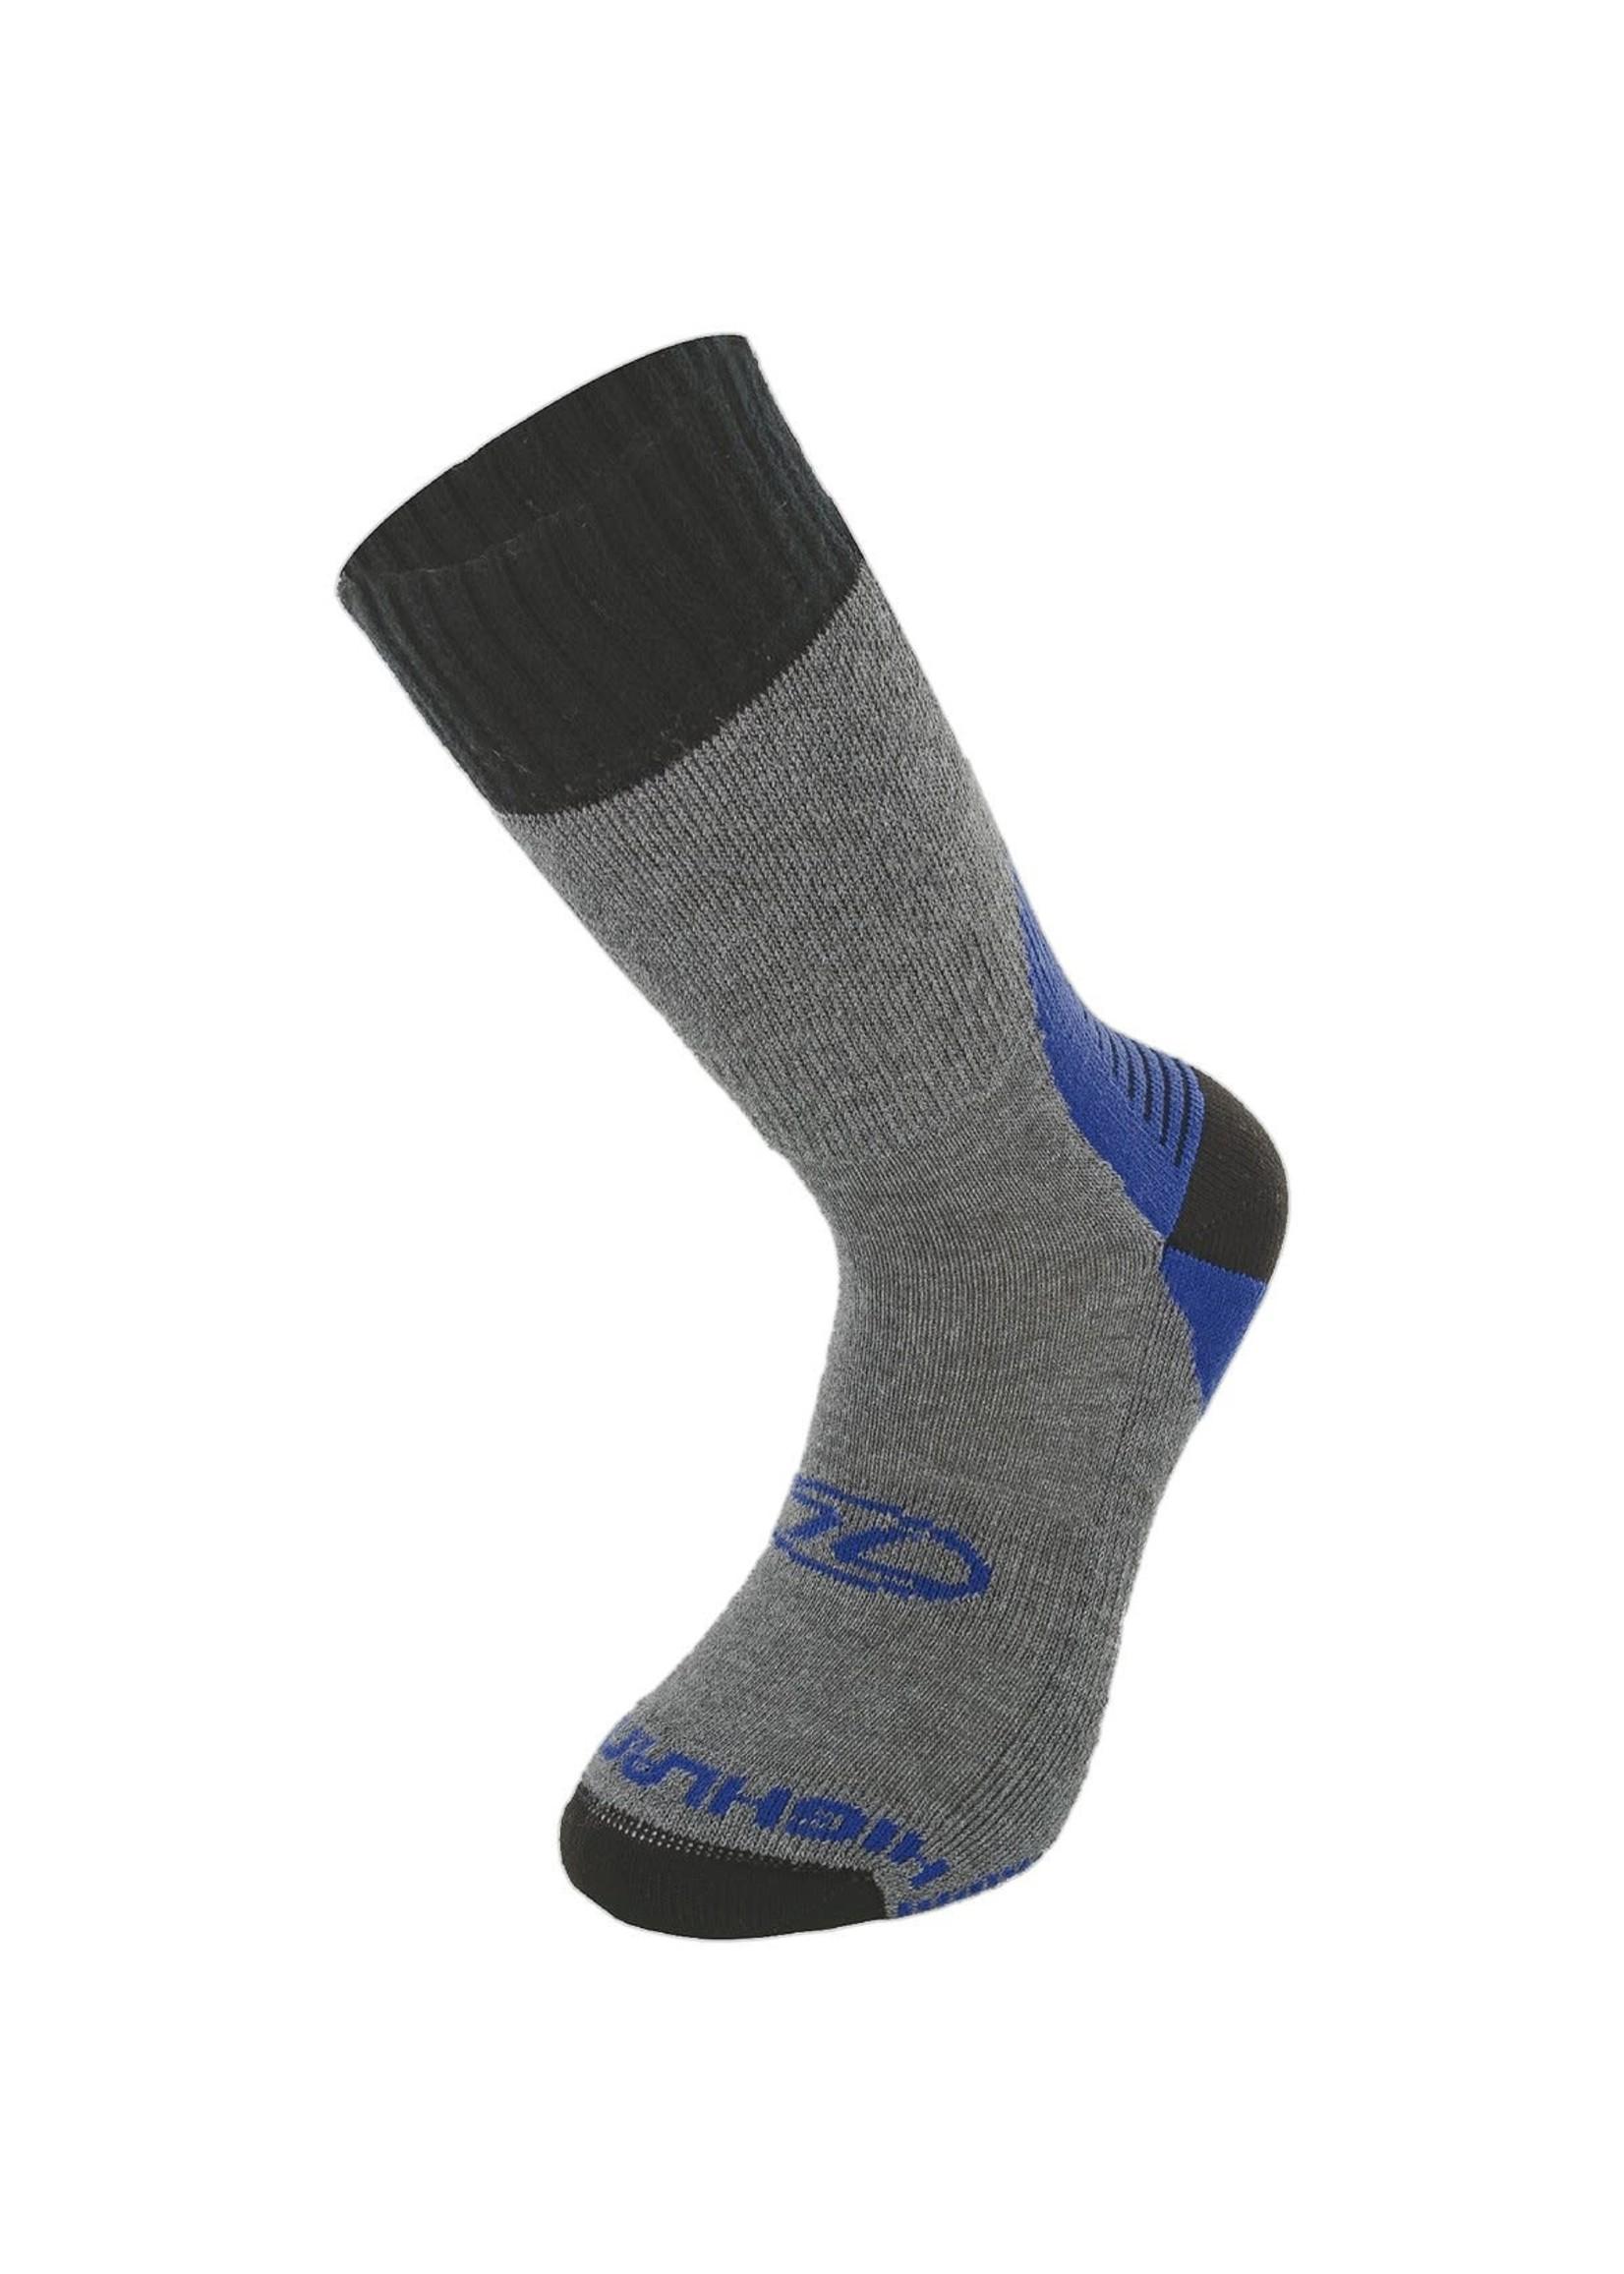 Highlander Highlander Explorer Coolmax Socks Mens